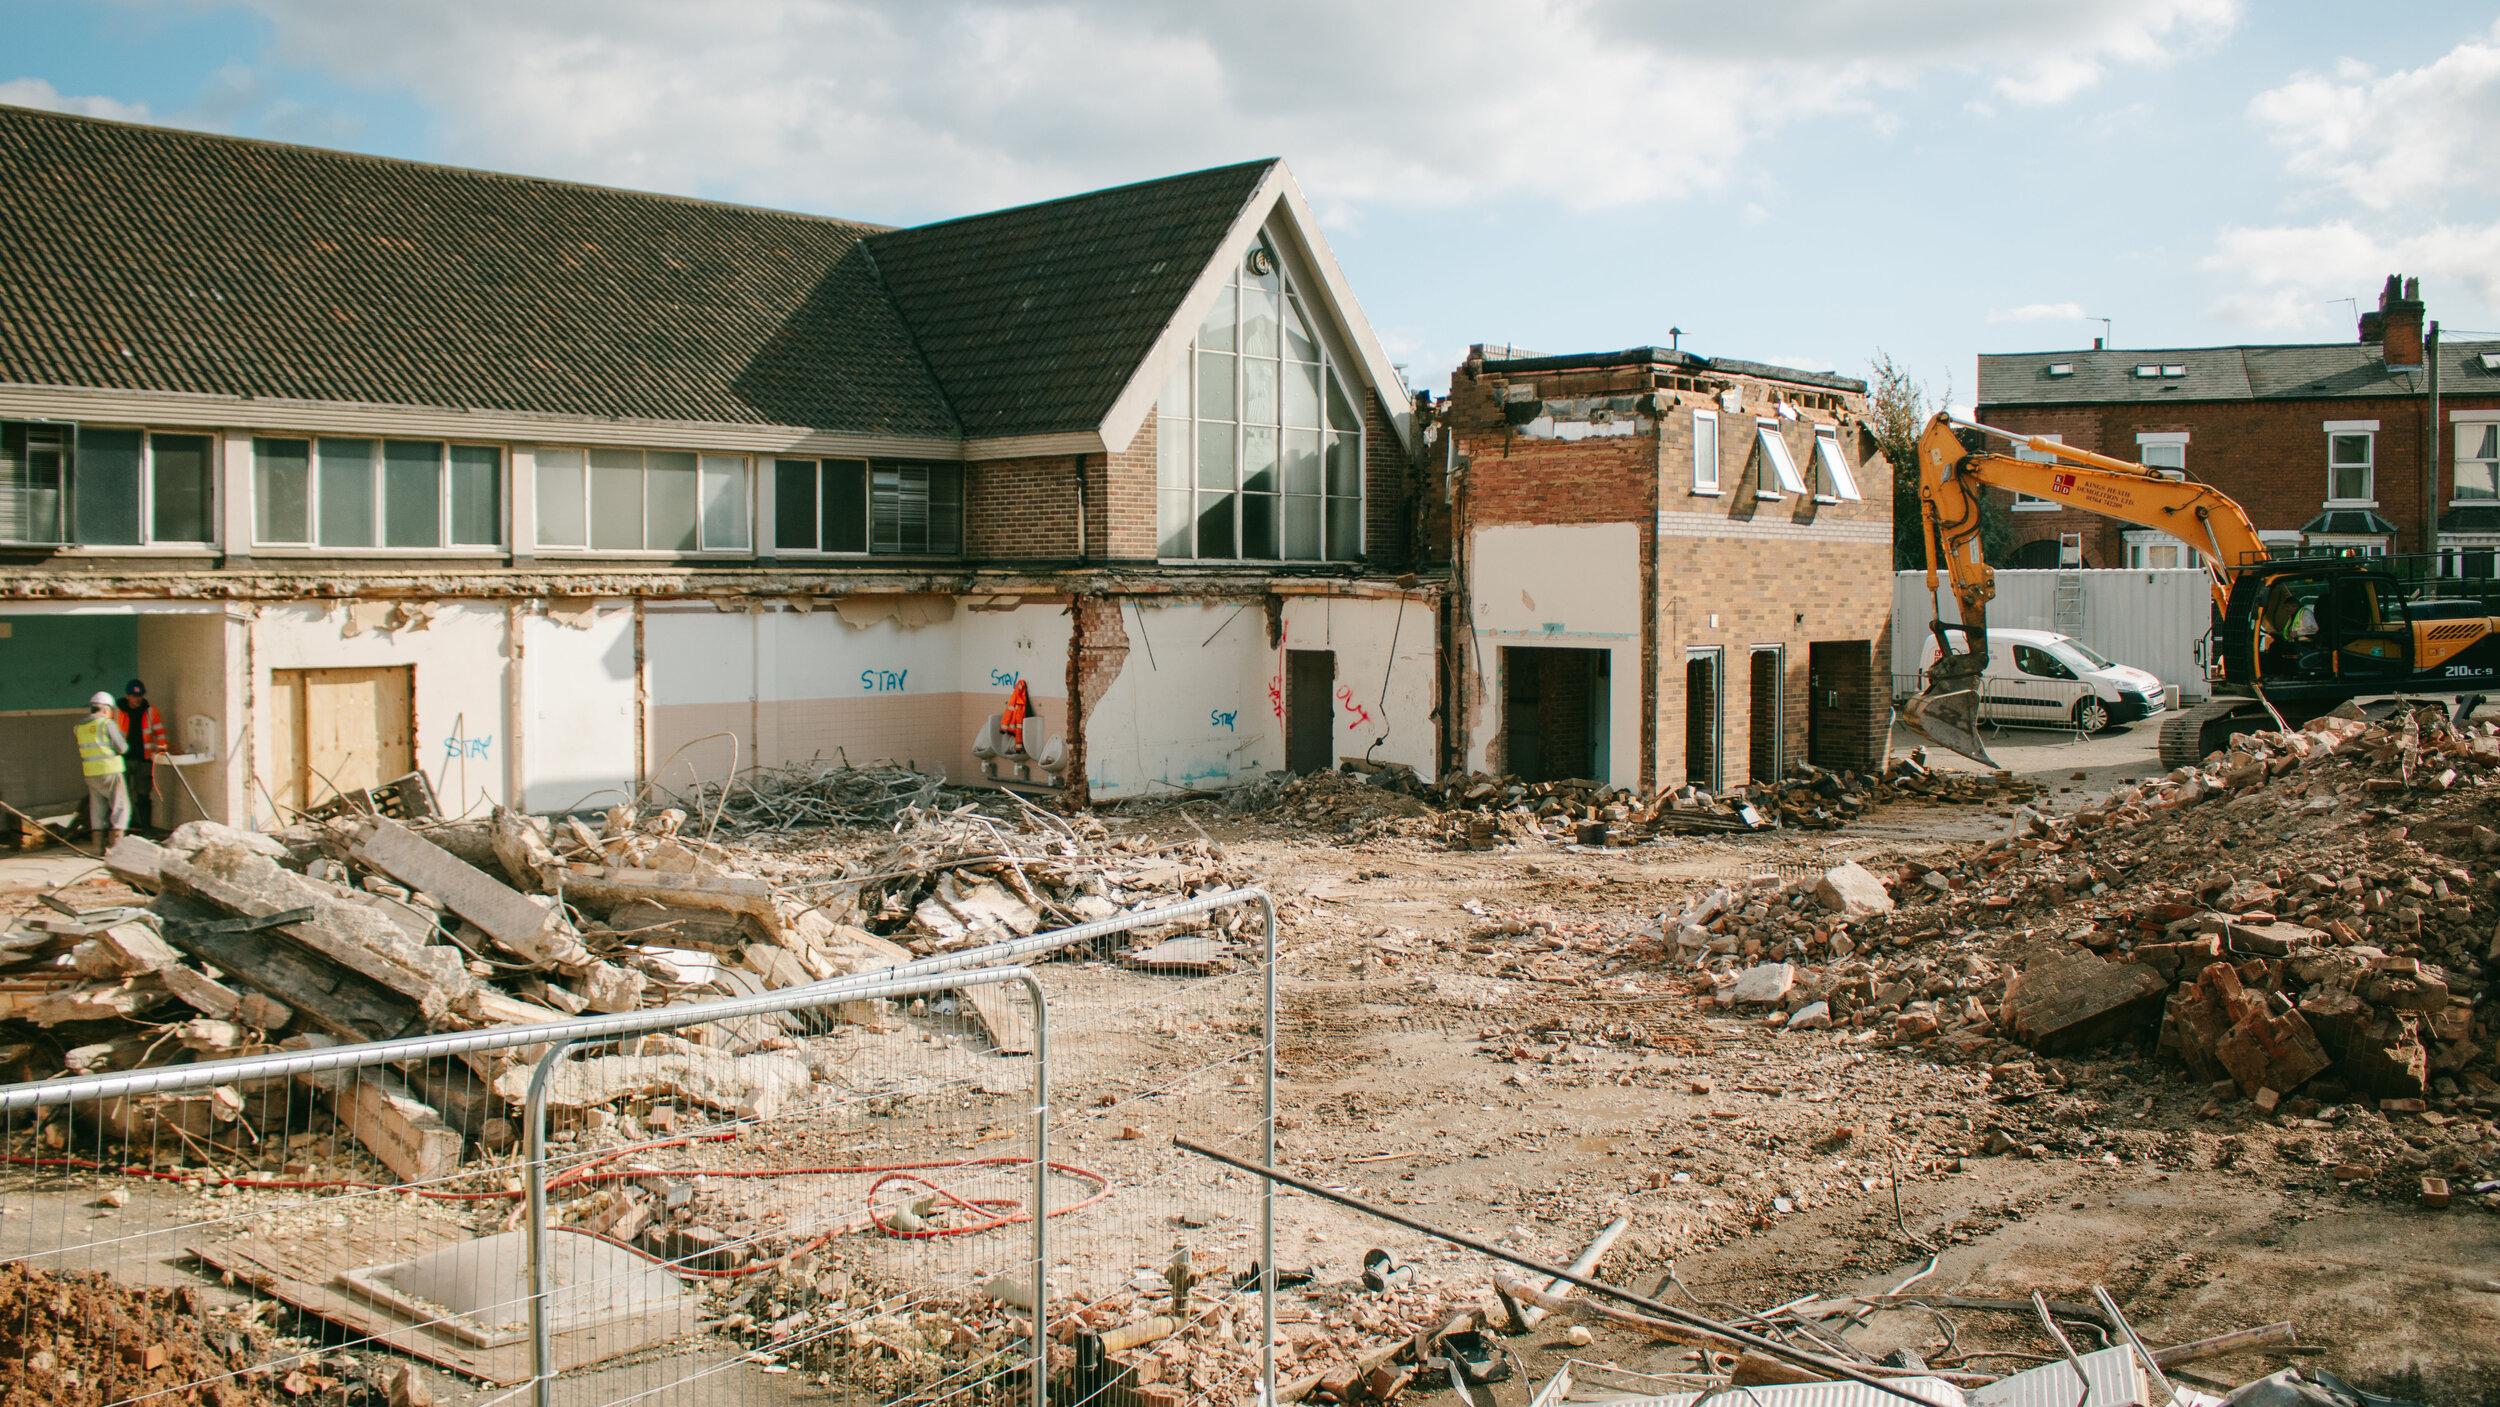 st-johns-harborne-bfm-demolition-oct-19-eo-2969-low.jpg